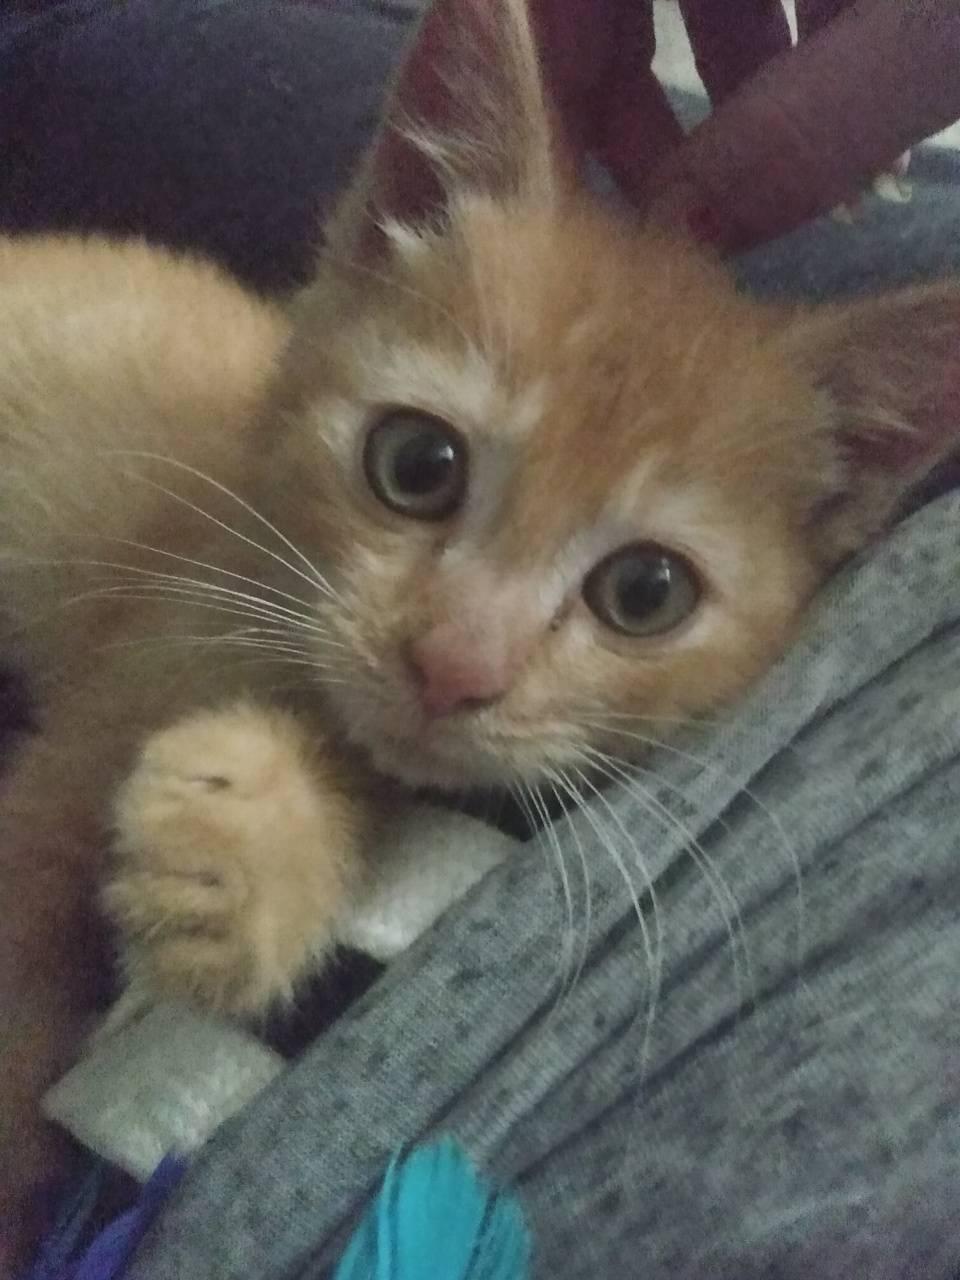 Cutest kitten face